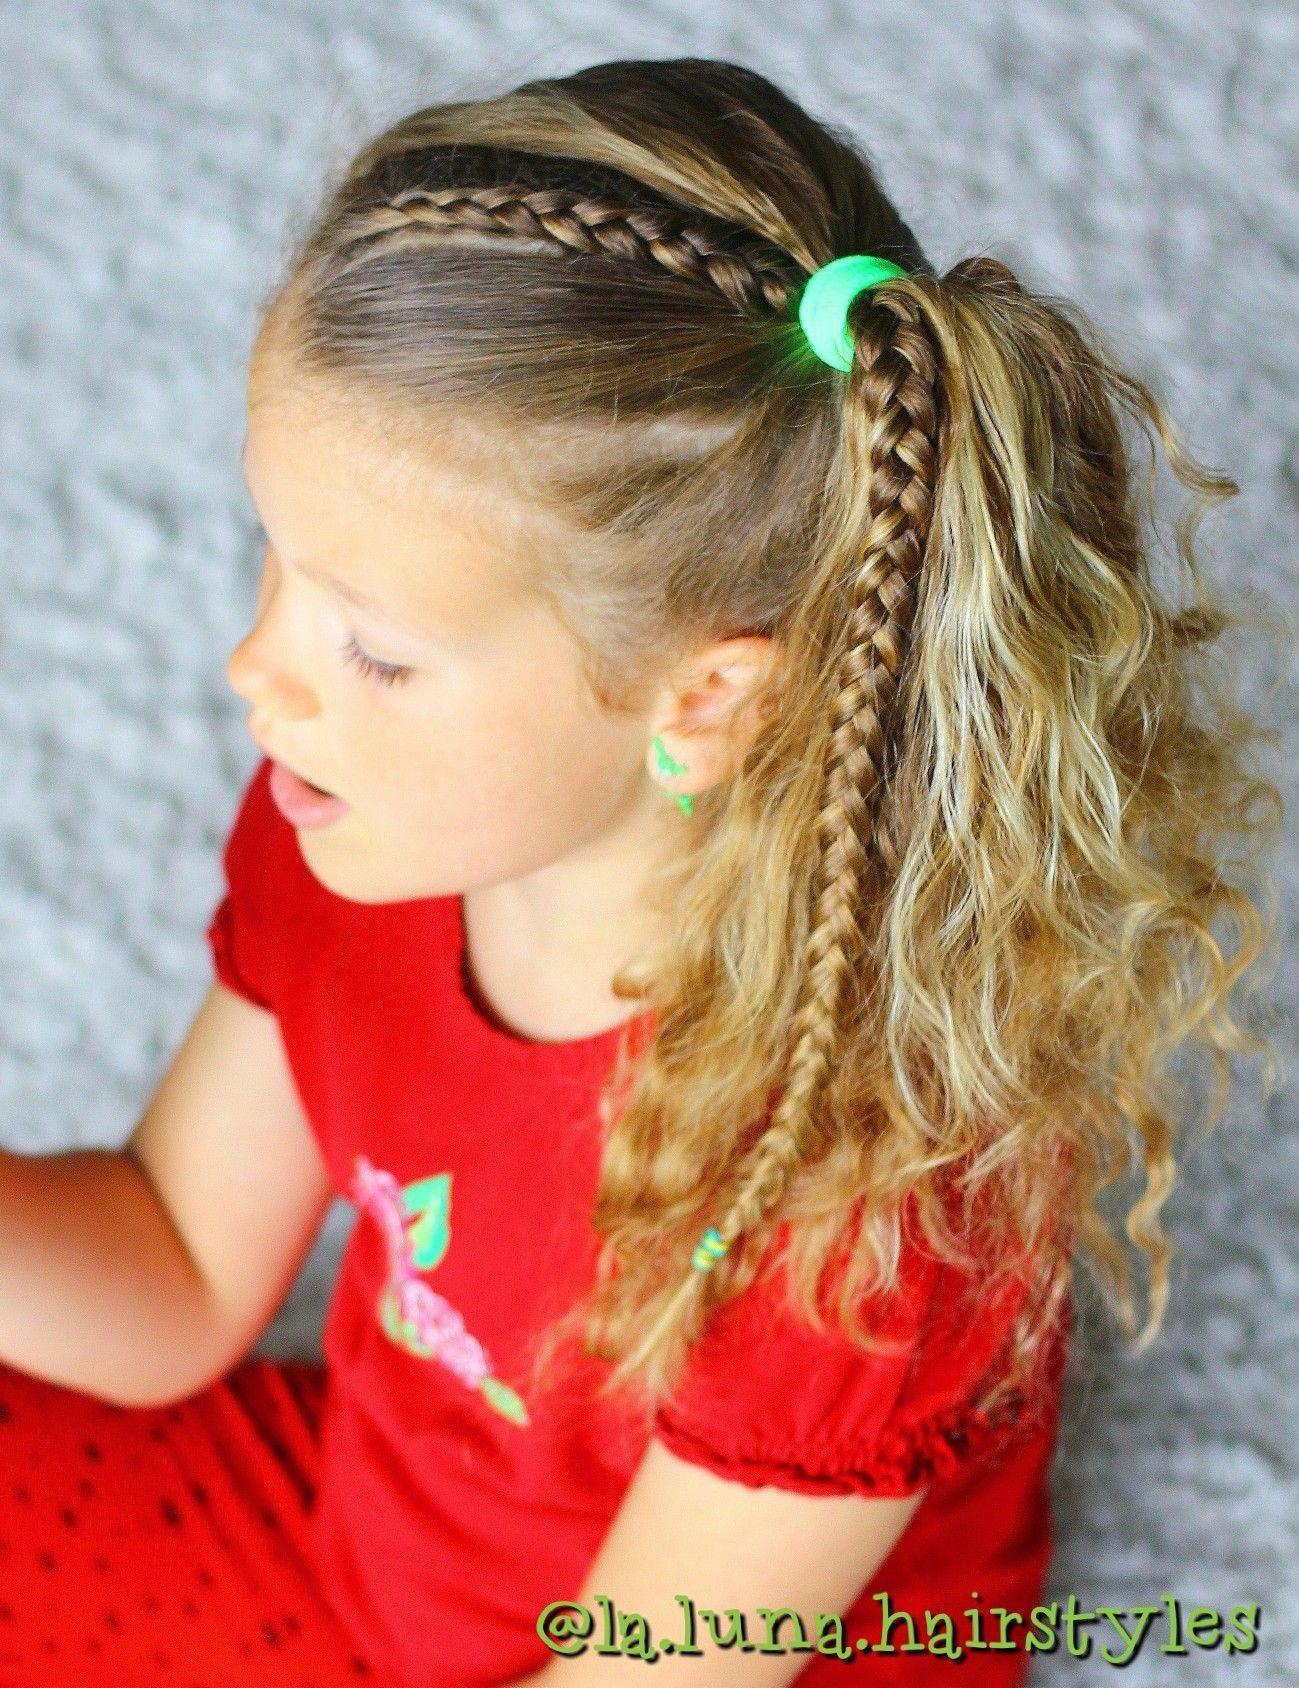 Simple easy hairstyle #easyhairstylesforwork | Braided hairstyles easy, Girls hairstyles easy ...